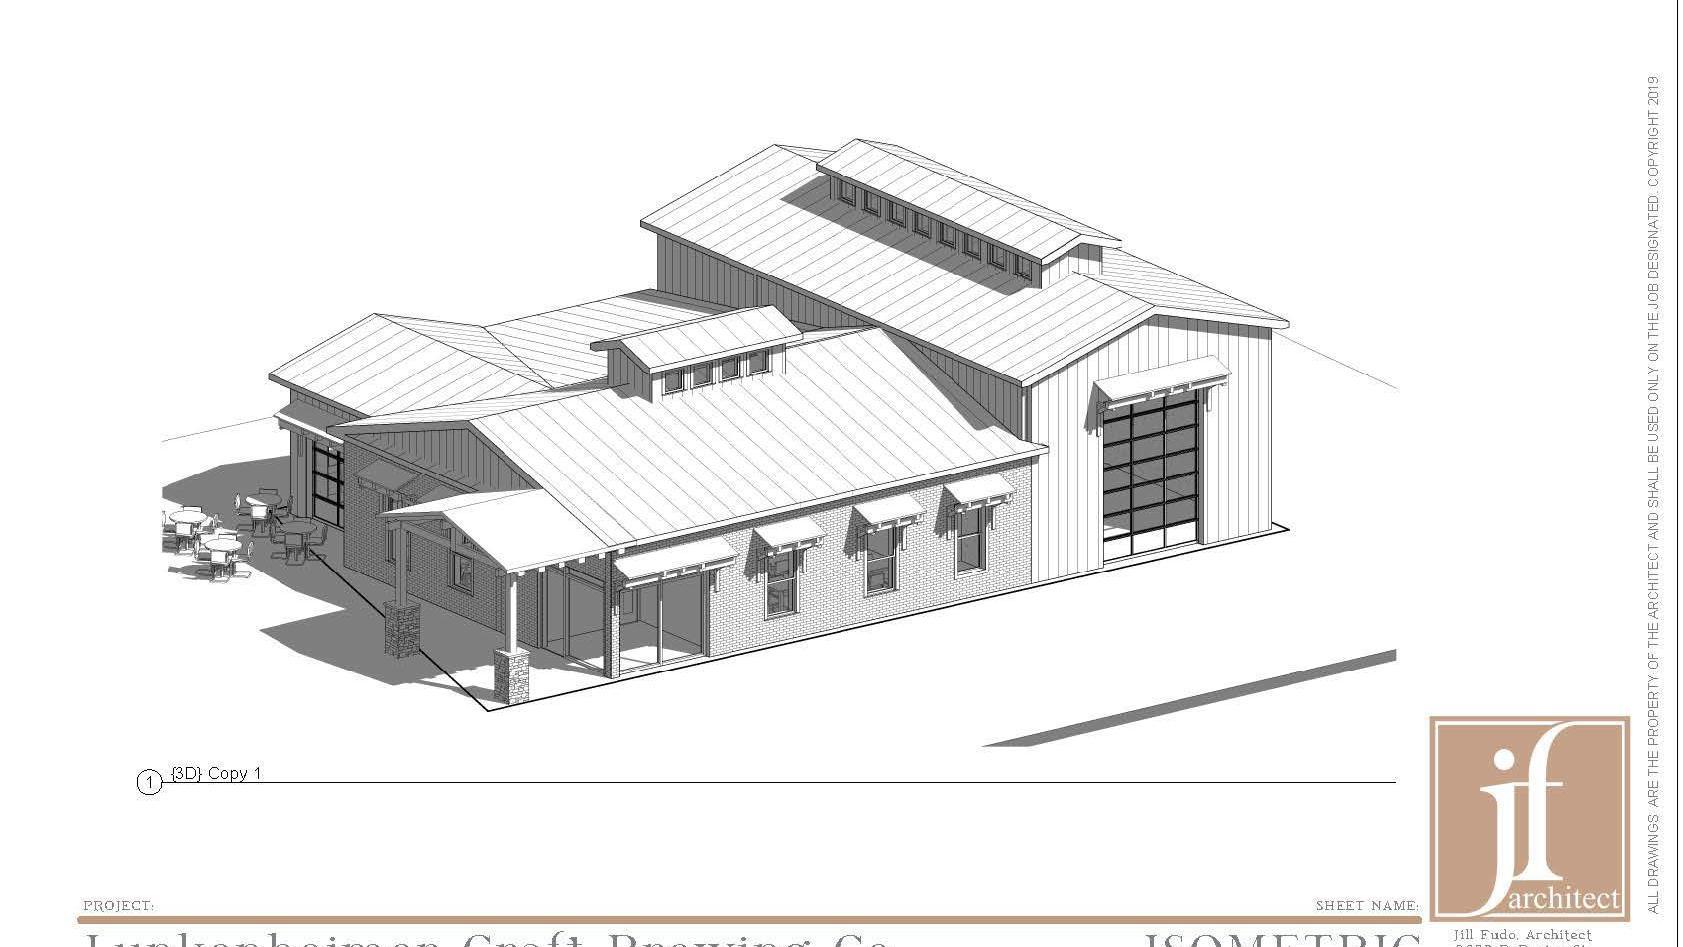 Lunkenheimer to open new Weedsport brewery, Wayne County tasting room